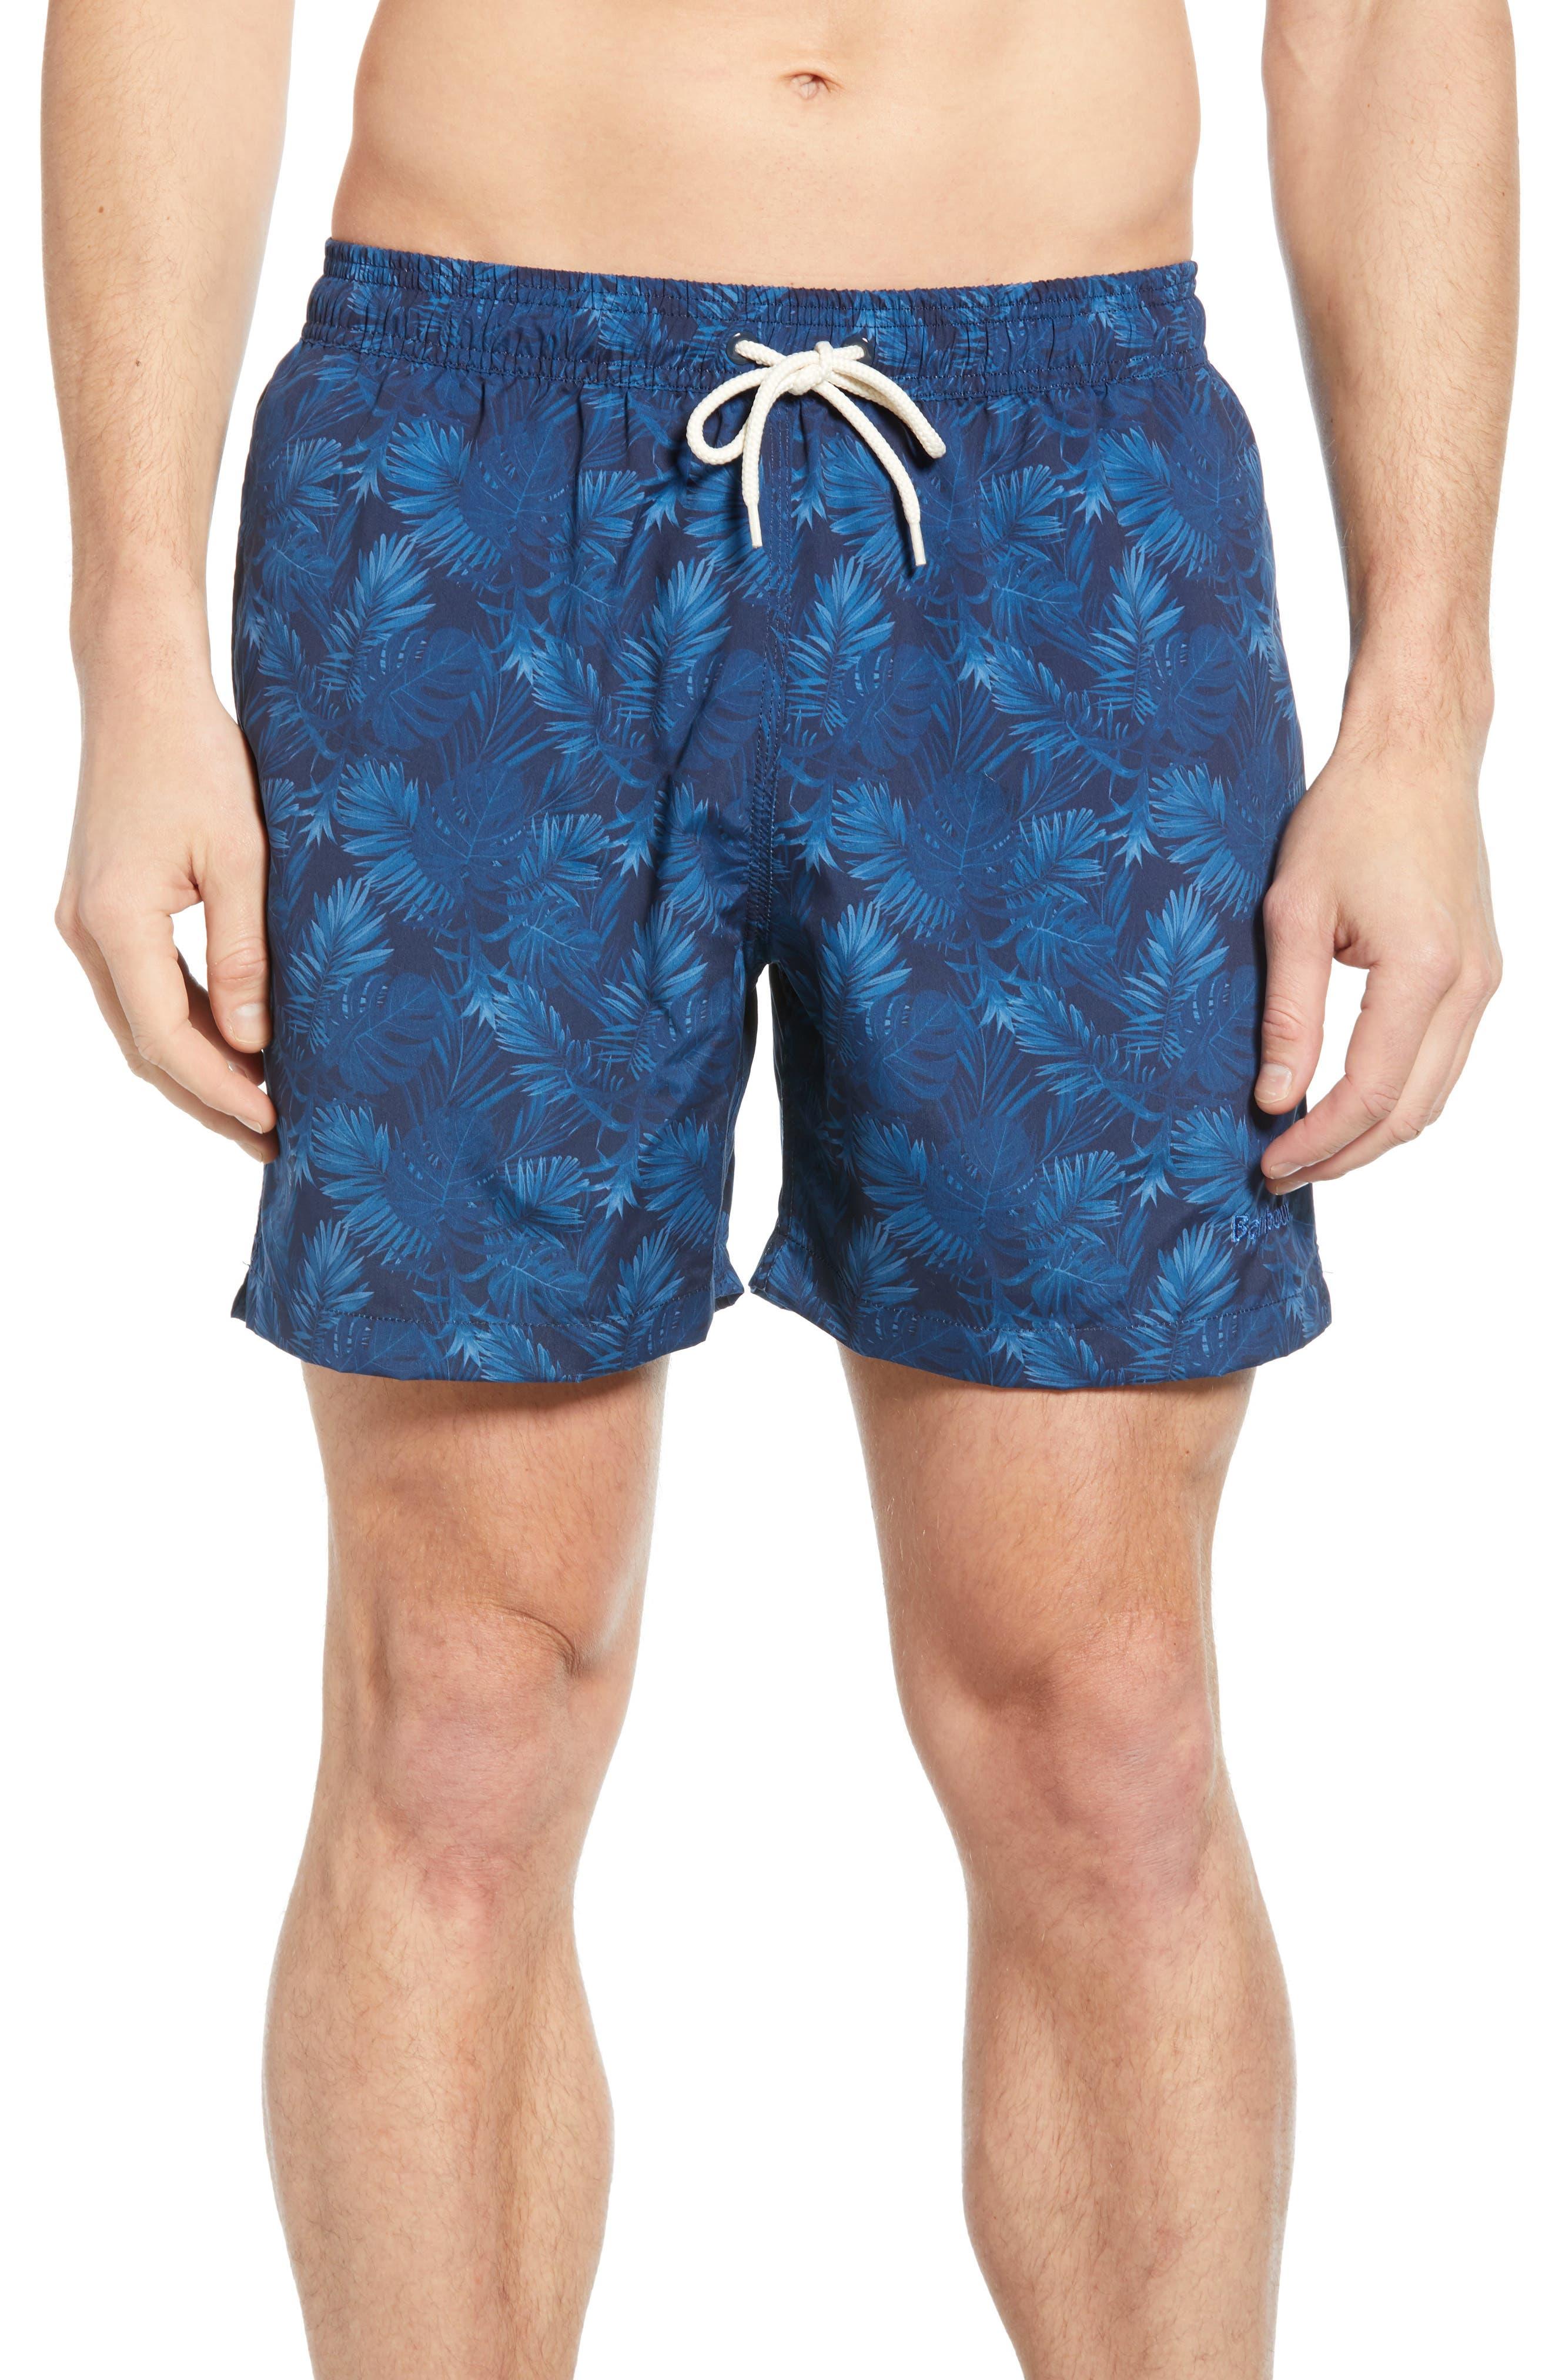 Barbour Tropical Print Swim Trunks, Blue